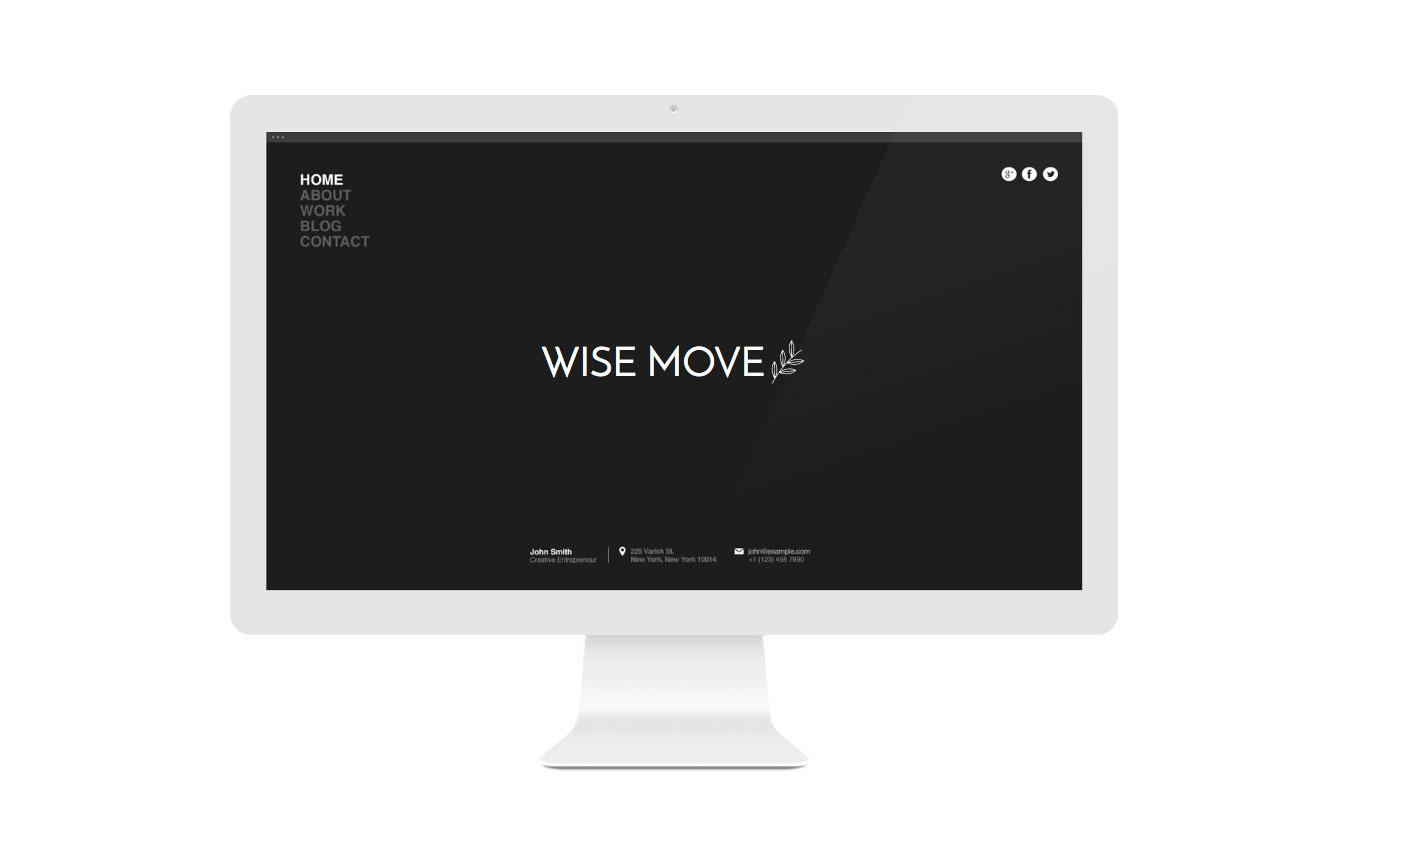 Wise_Move_Logos_16.jpg